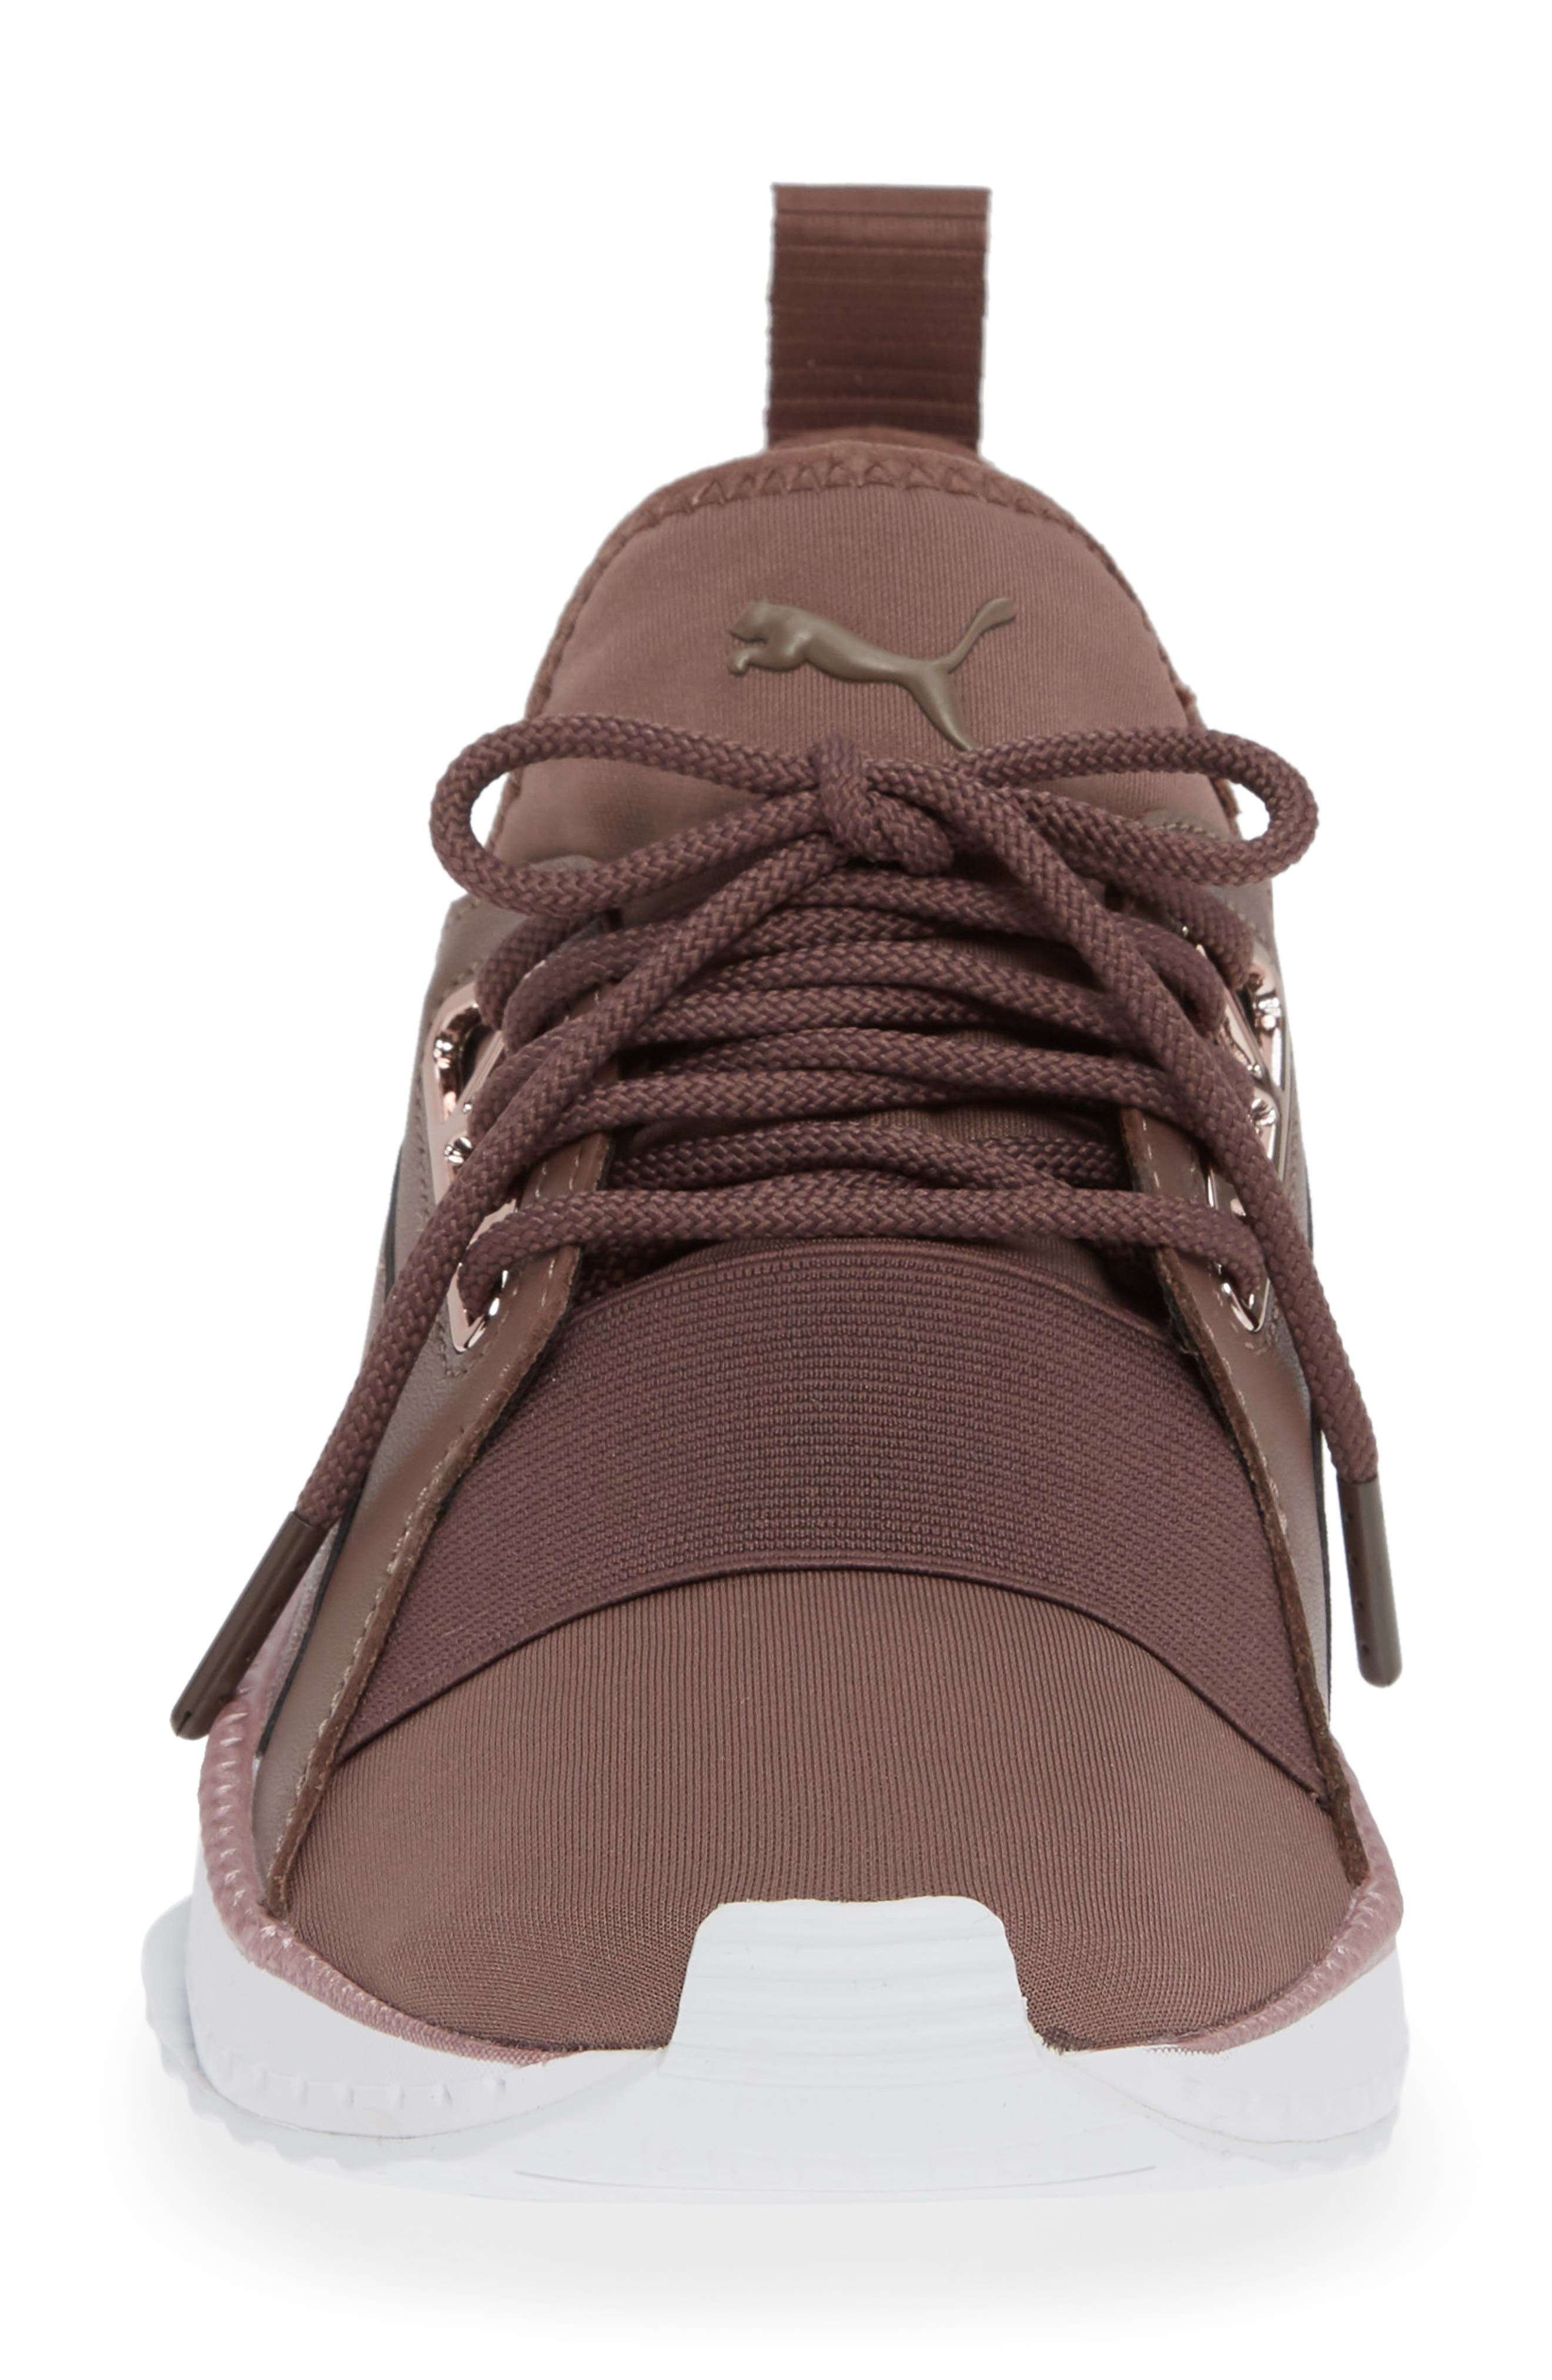 PUMA, TSUGI Apex Jewel Sneaker, Alternate thumbnail 4, color, PEPPERCORN/ PEPPERCORN